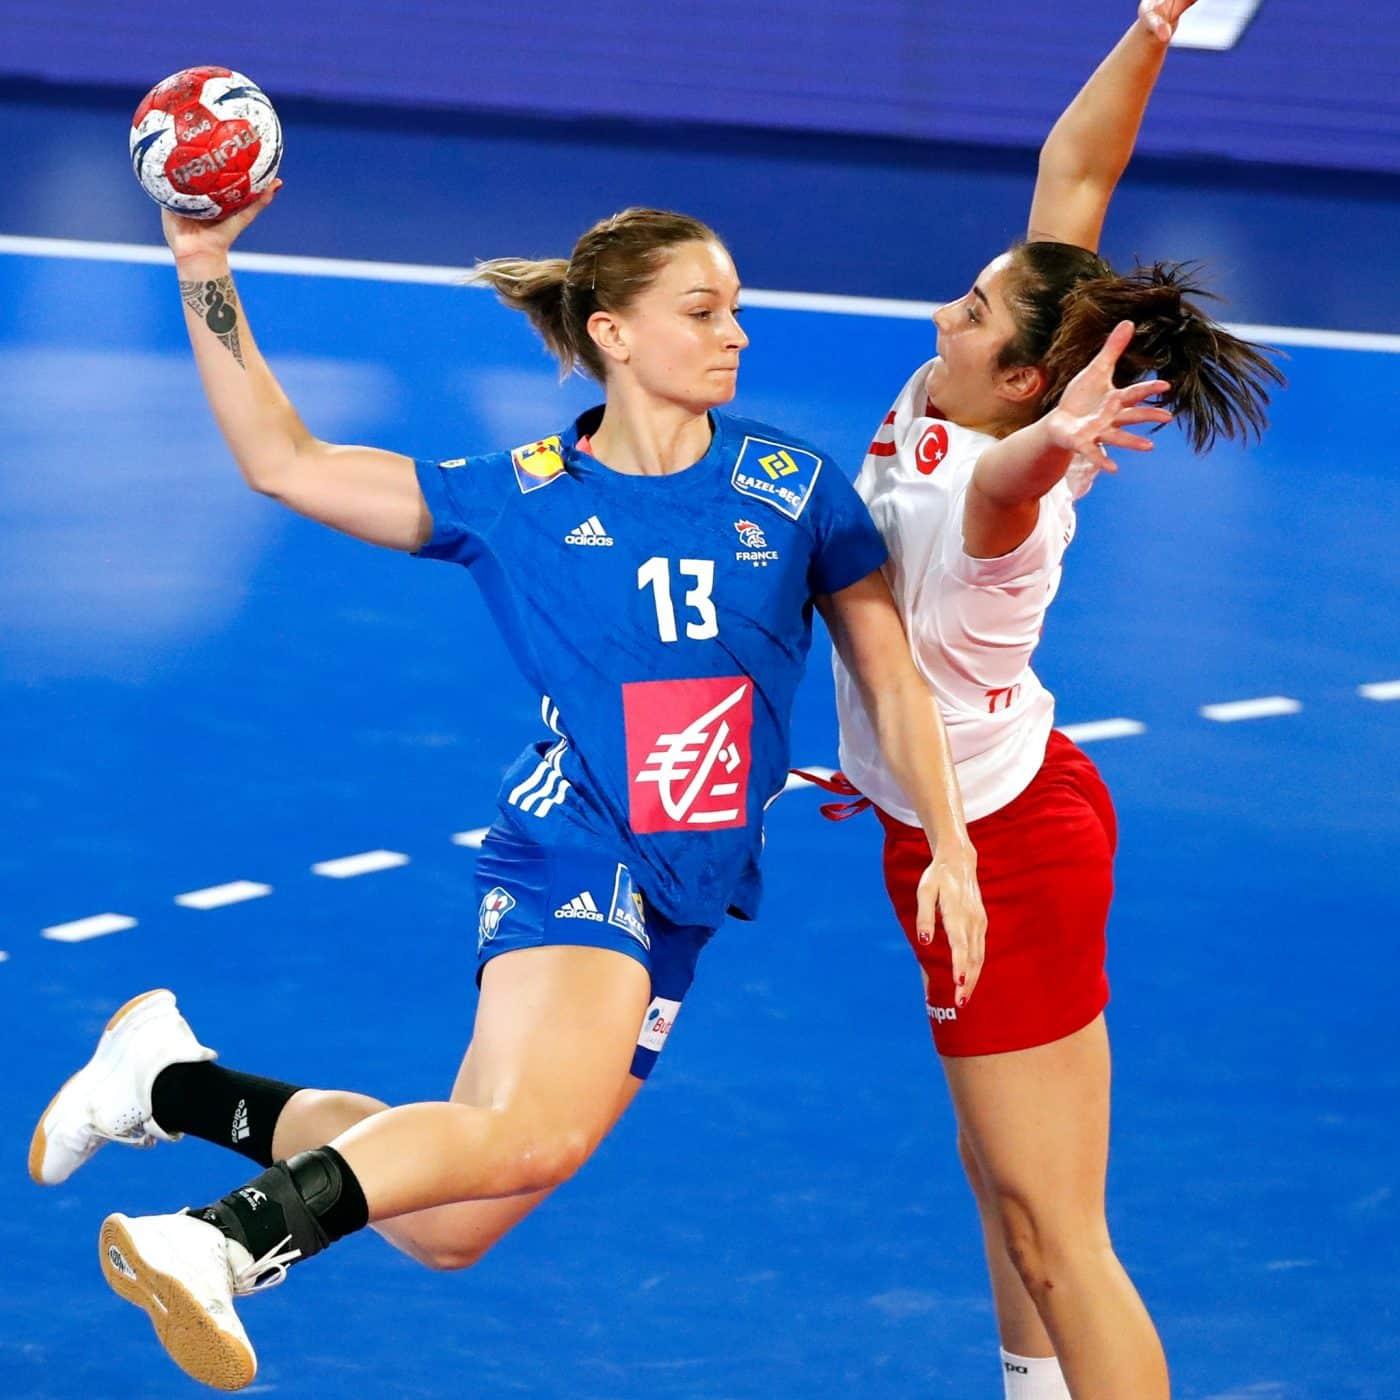 octobre-rose-équipe-de-france-handball-2019-caisse-d-epargne-1